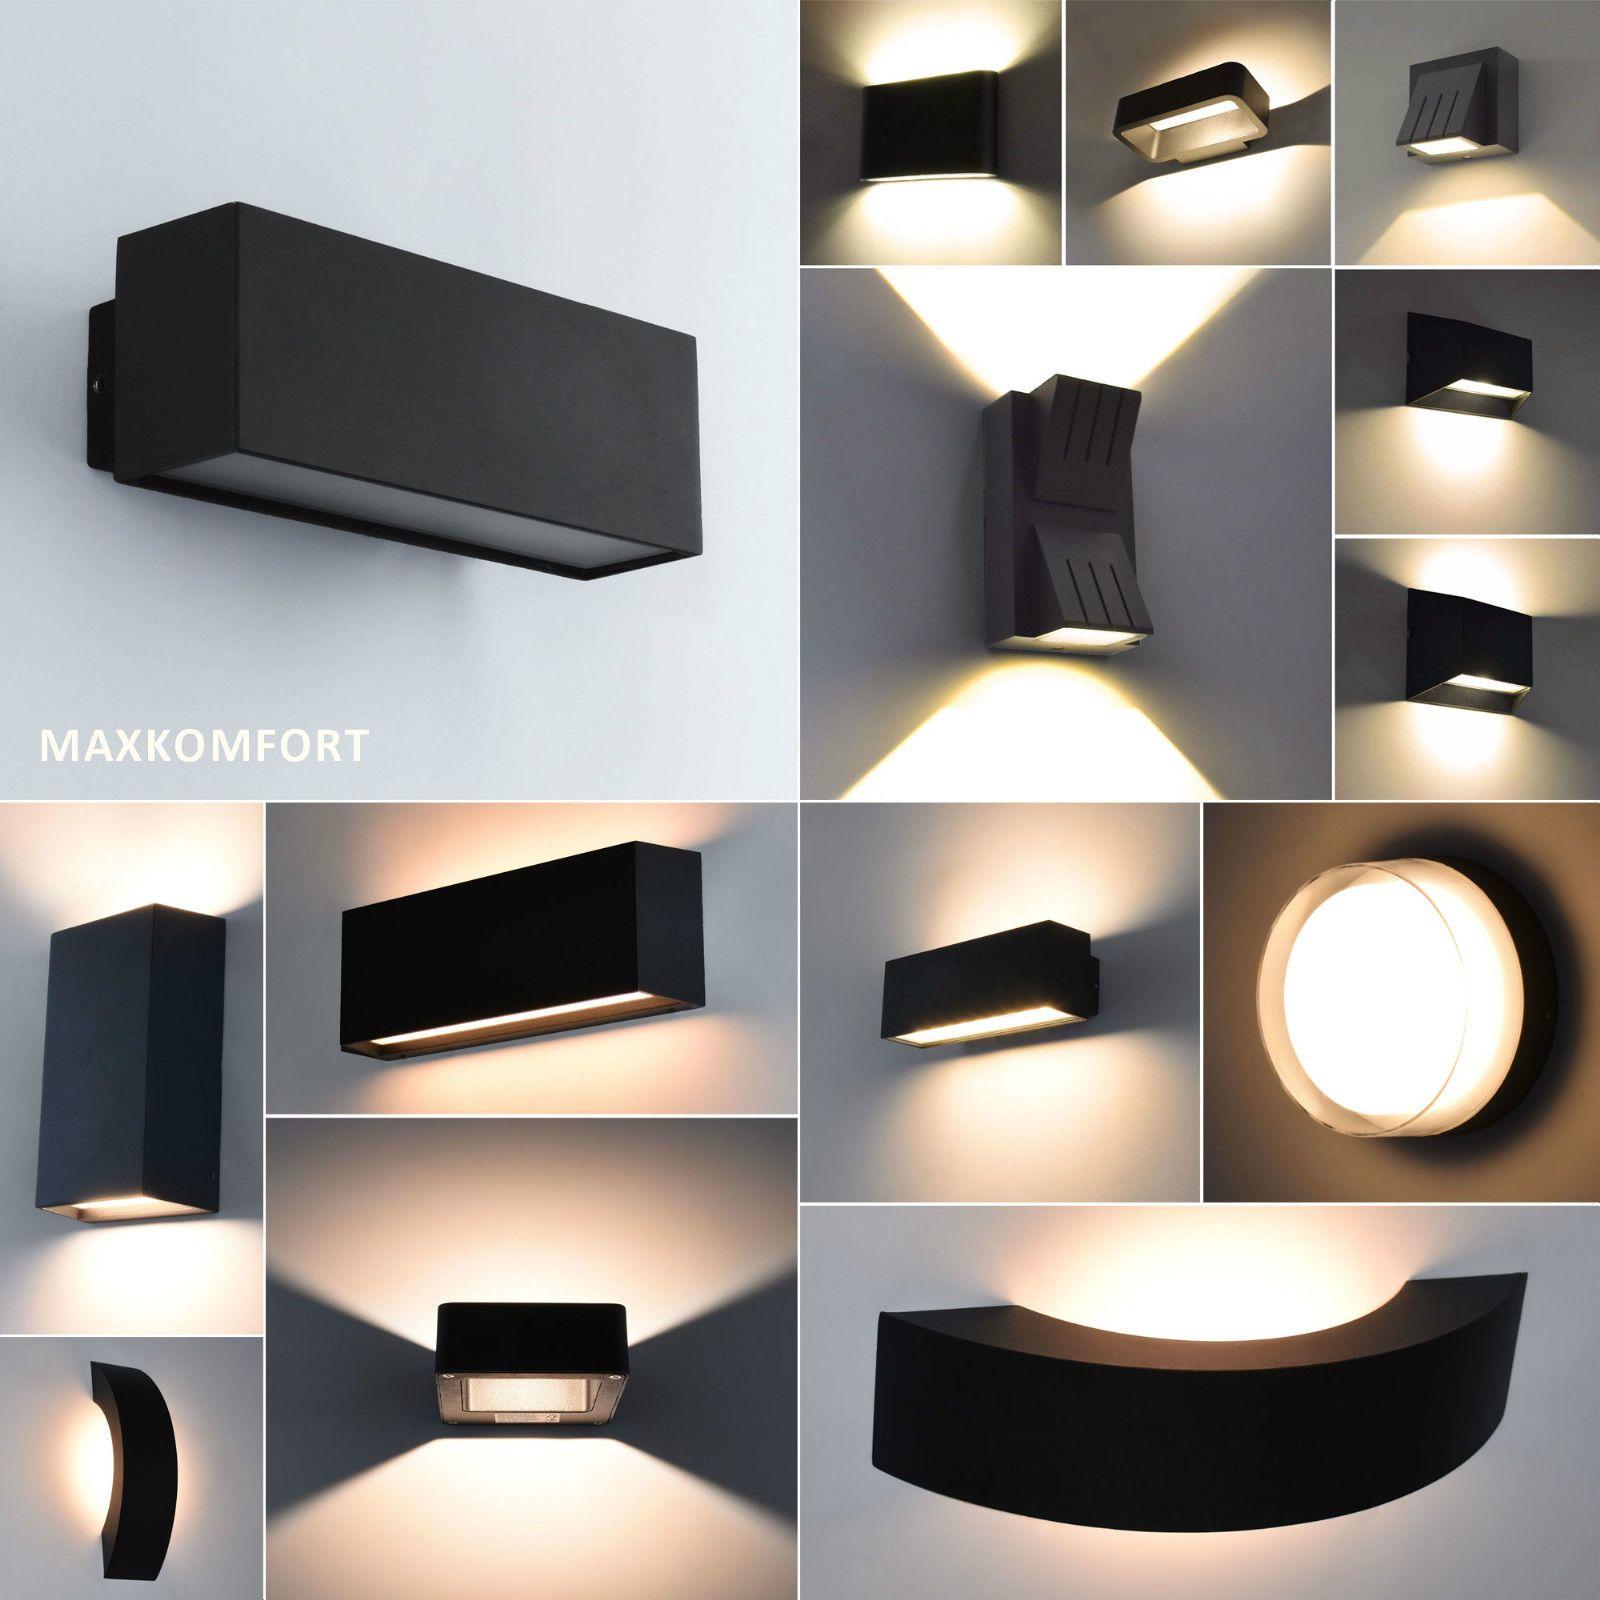 Led Aussenleuchte Wandleuchte Aussenlampe Wandlampe Gartenleuchte Aussenwandlampe Ebay Aussenlampe Wandleuchte Wandlampe